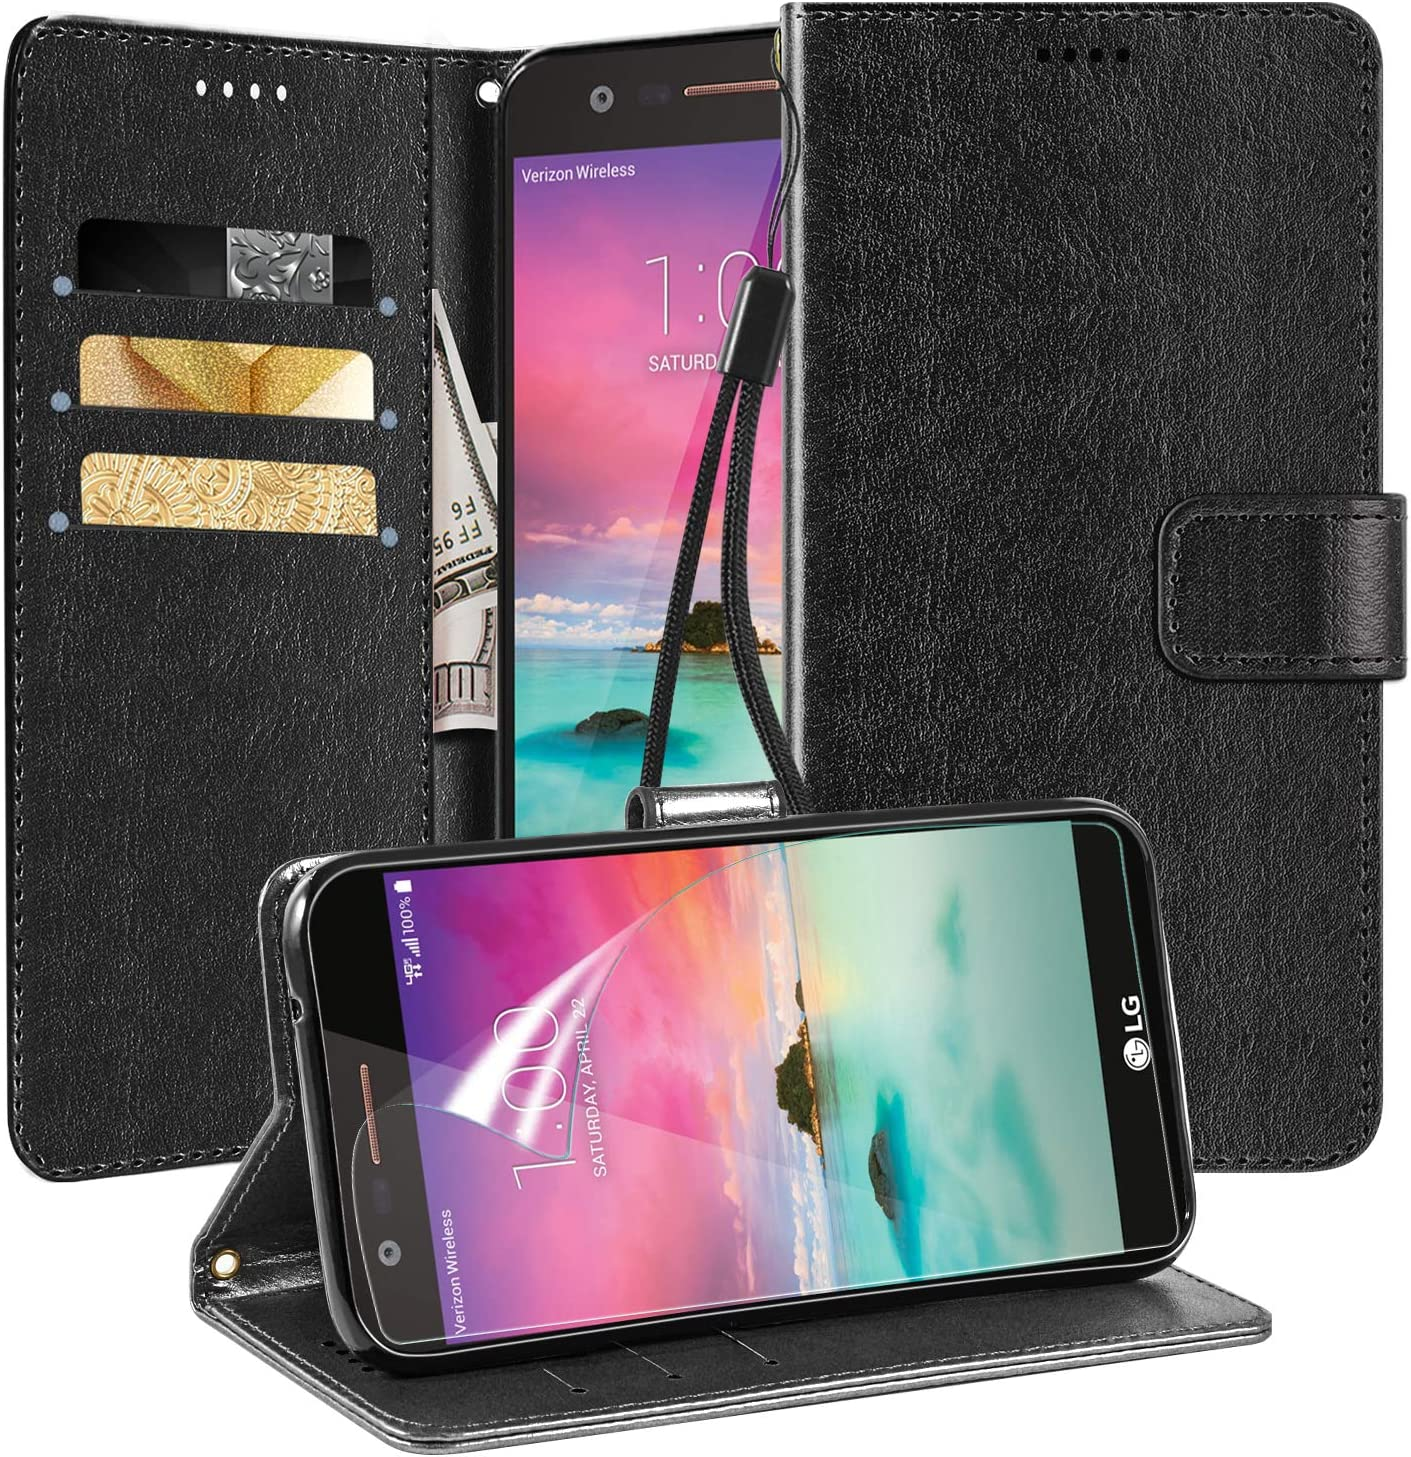 LG K20 Plus Case,LG K20/LG Harmony/LG LV5/LG Grace LTE/LG V K20V W [HD Screen Protector] Card Slots Kickstand Durable Crazy Horse Pattern PU Leather Wallet Case,Black